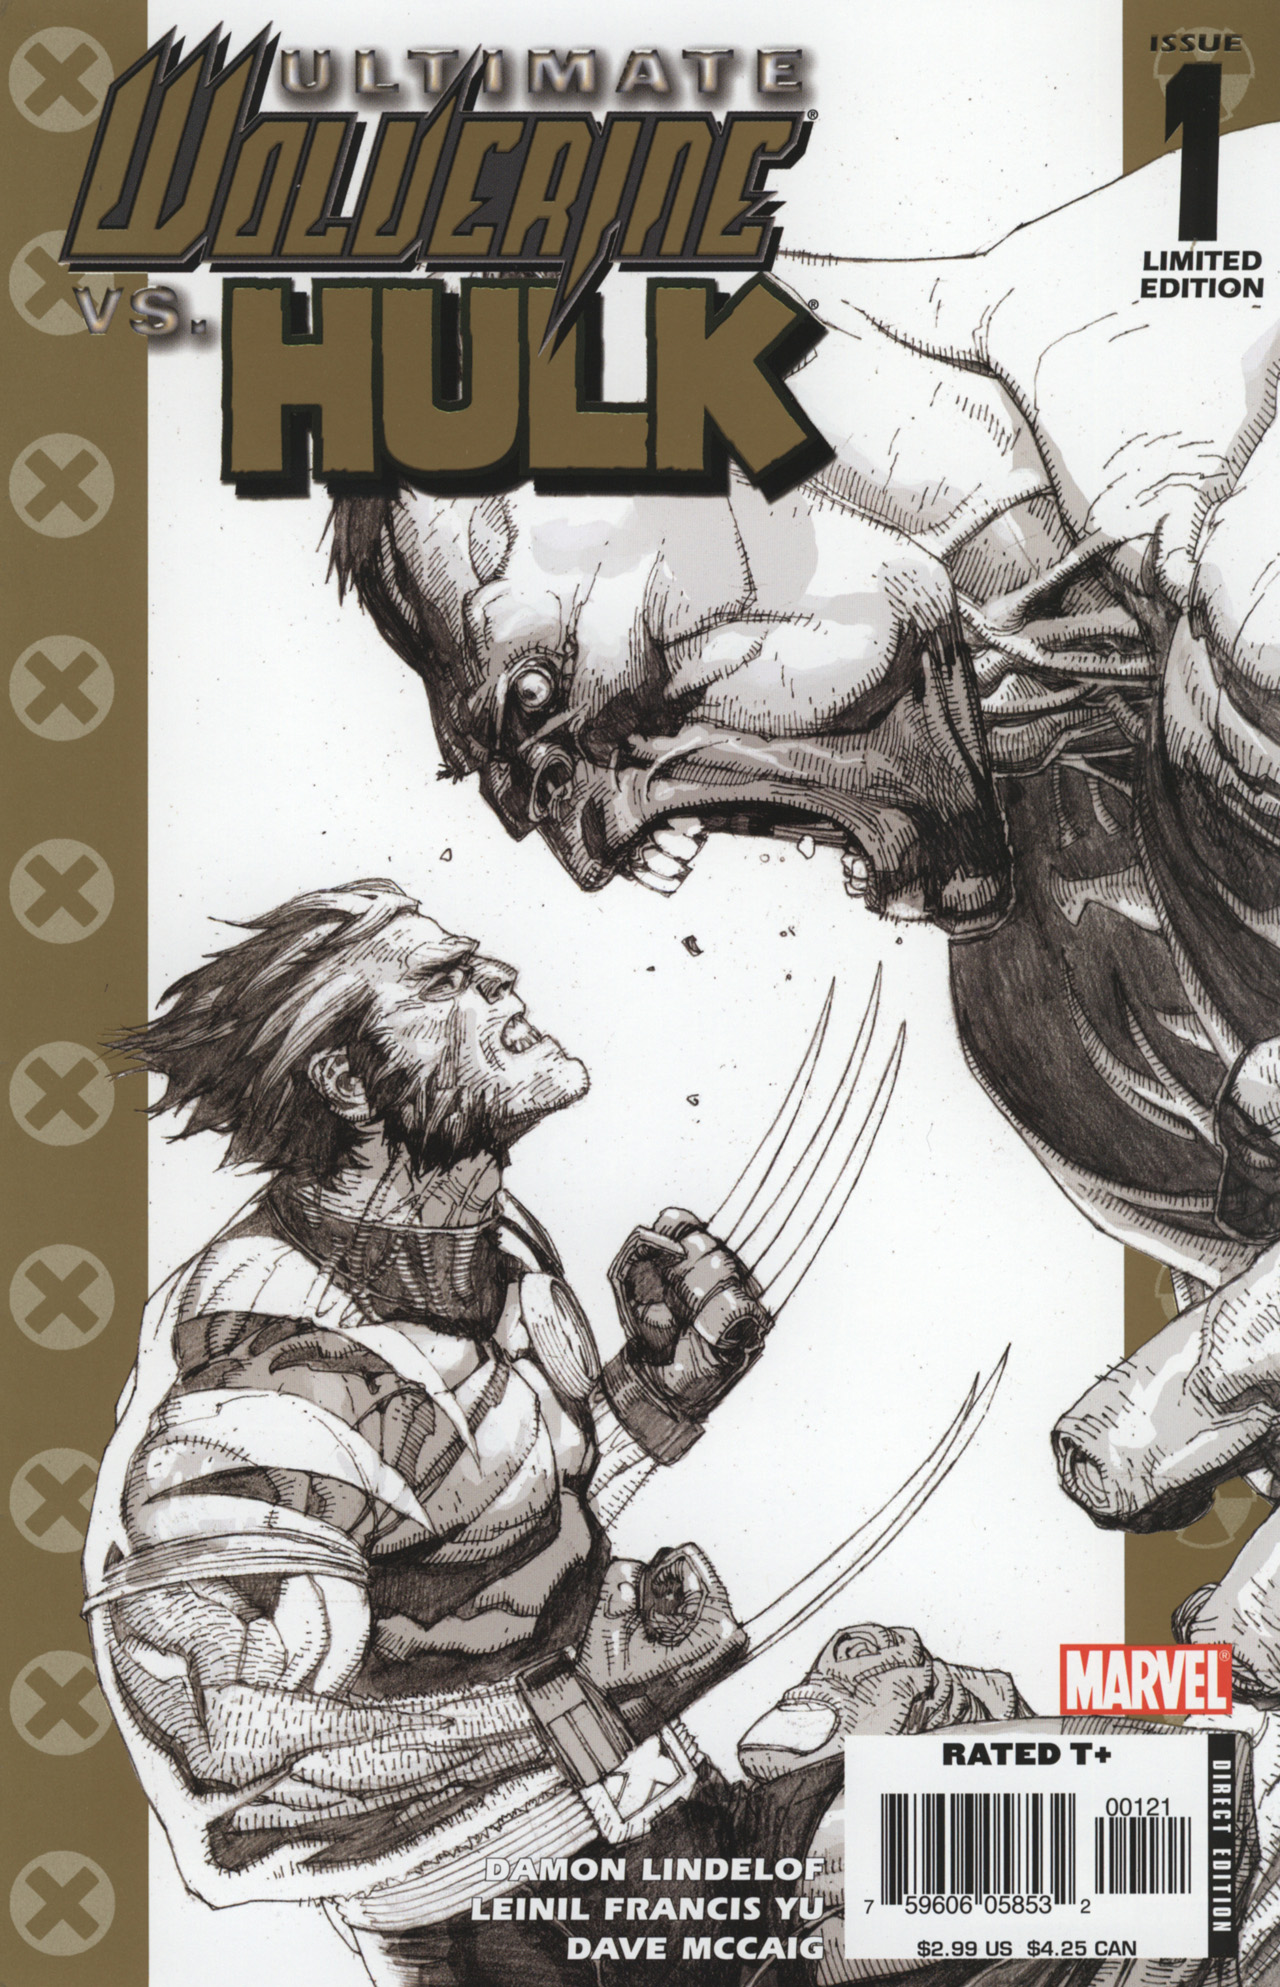 Ultimate Wolverine vs. Hulk Vol 1 1 Limited Edition.jpg